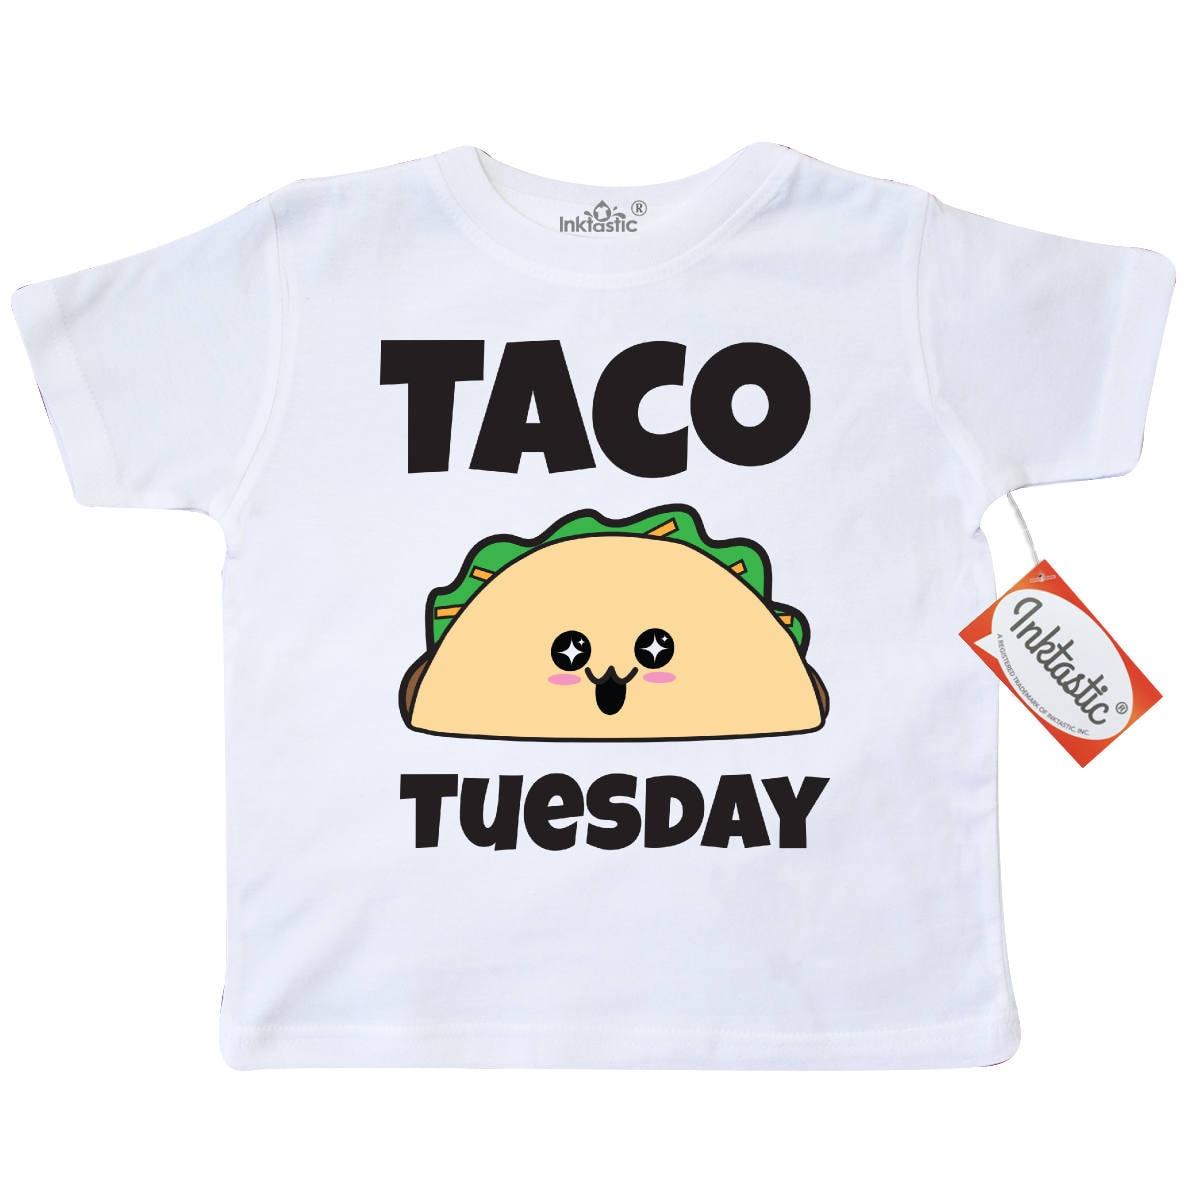 5da7f339 Kawaii Taco Tuesday Toddler T-Shirt by Inktastic | Etsy